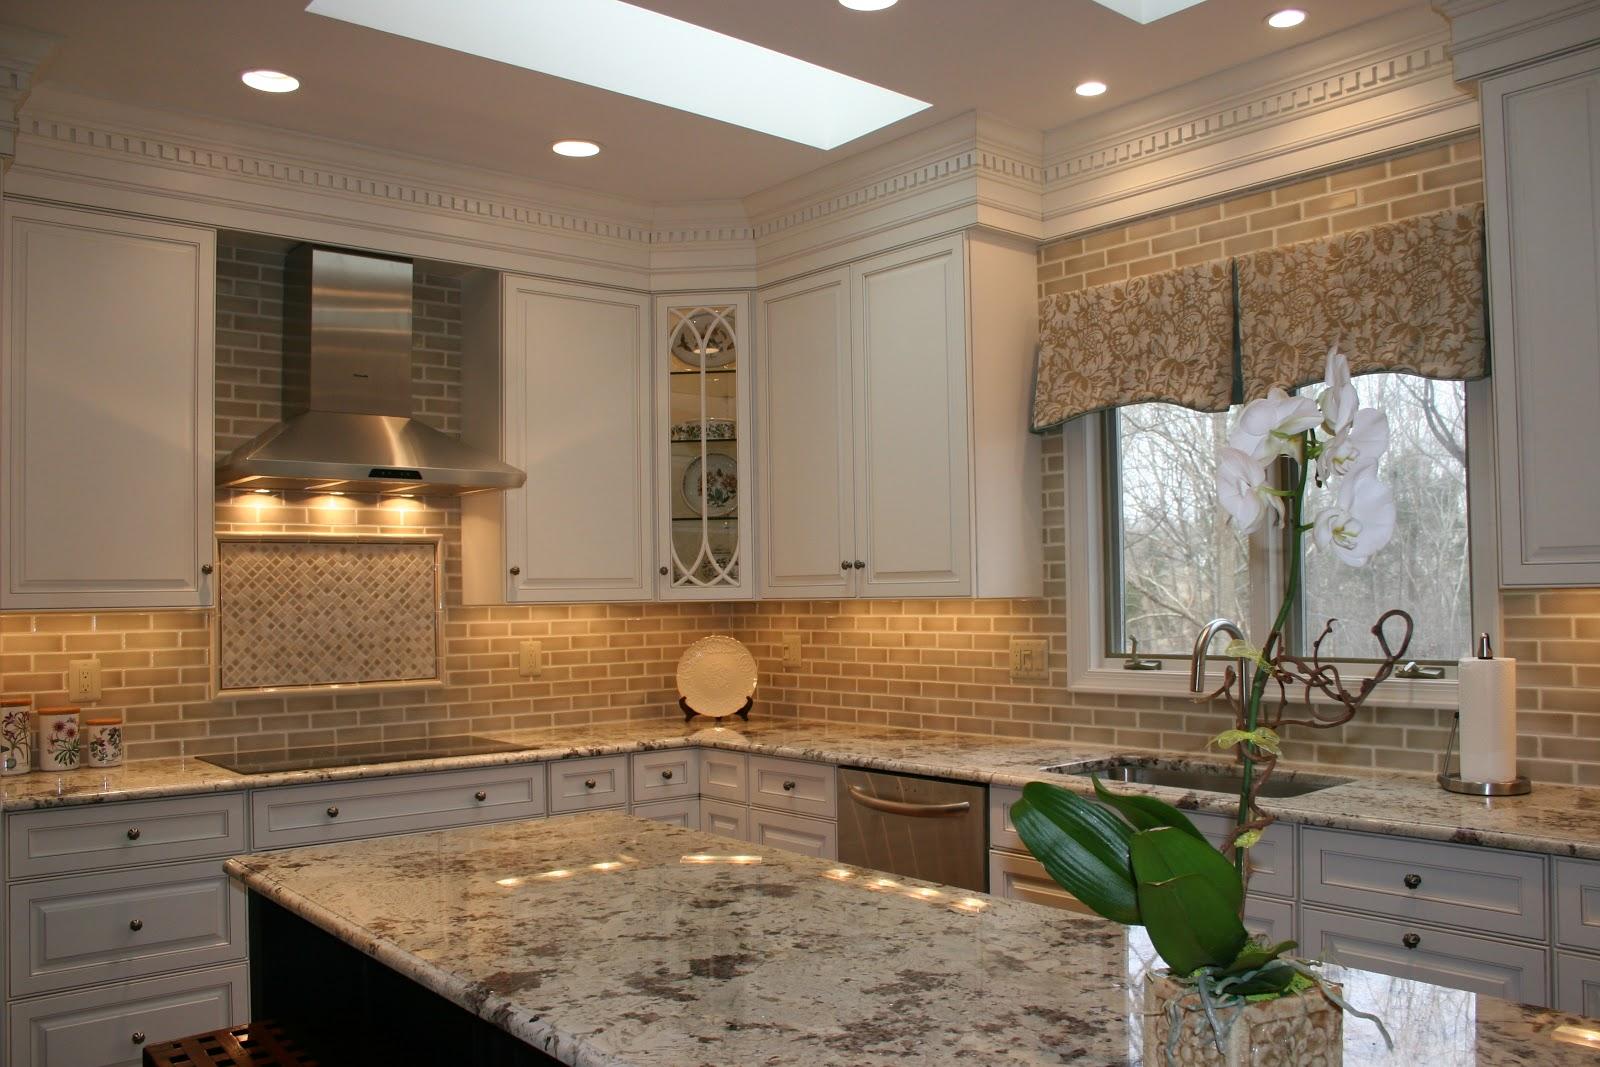 kitchens and baths by amy southard traditional kitchen backsplash. Interior Design Ideas. Home Design Ideas